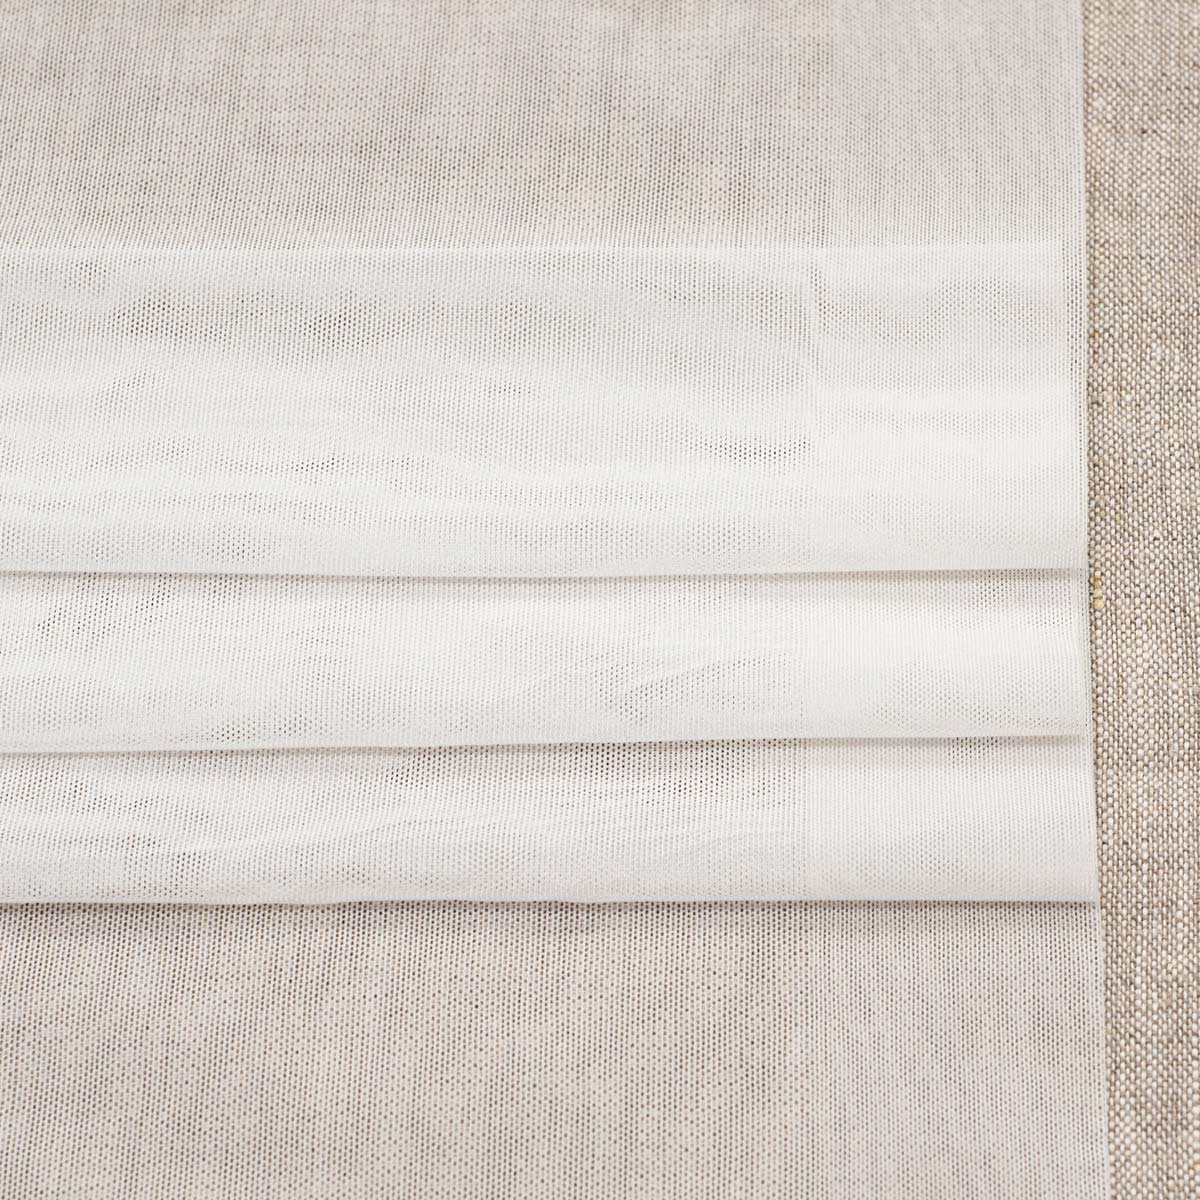 SU-31 Ткань эластичная бельевая 23,5 см*10 м, белый